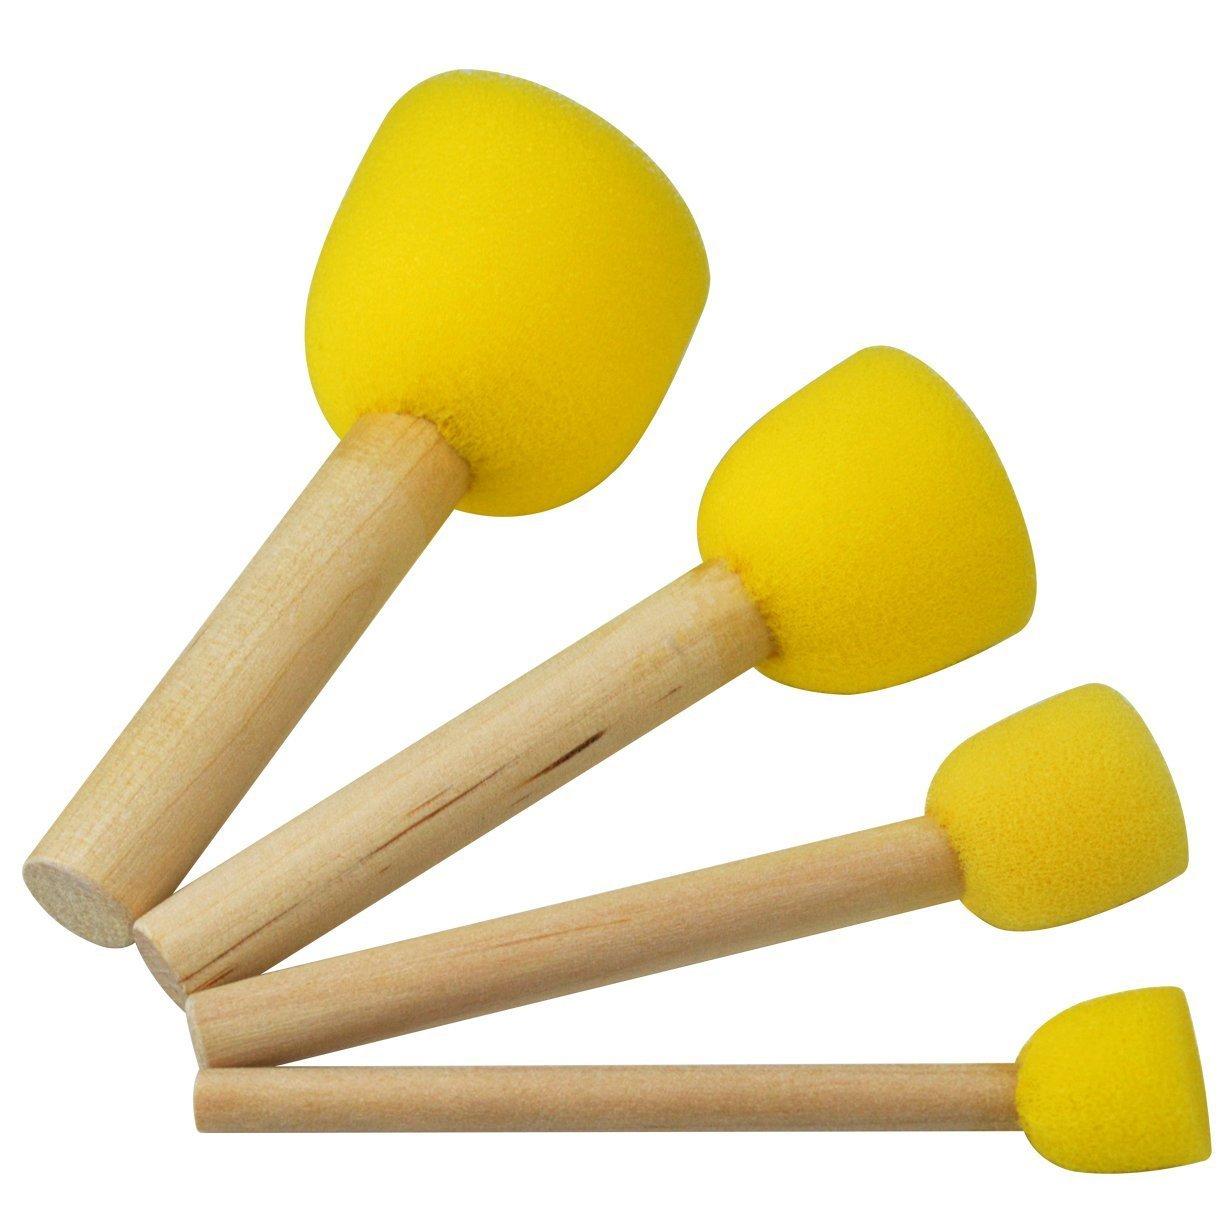 20 PCS Round Sponges Brush Set Kids Painting Tools Pistha Sponge Painting Stippler Set/Â/DIY Painting Tools in 4 Sizes for Kids